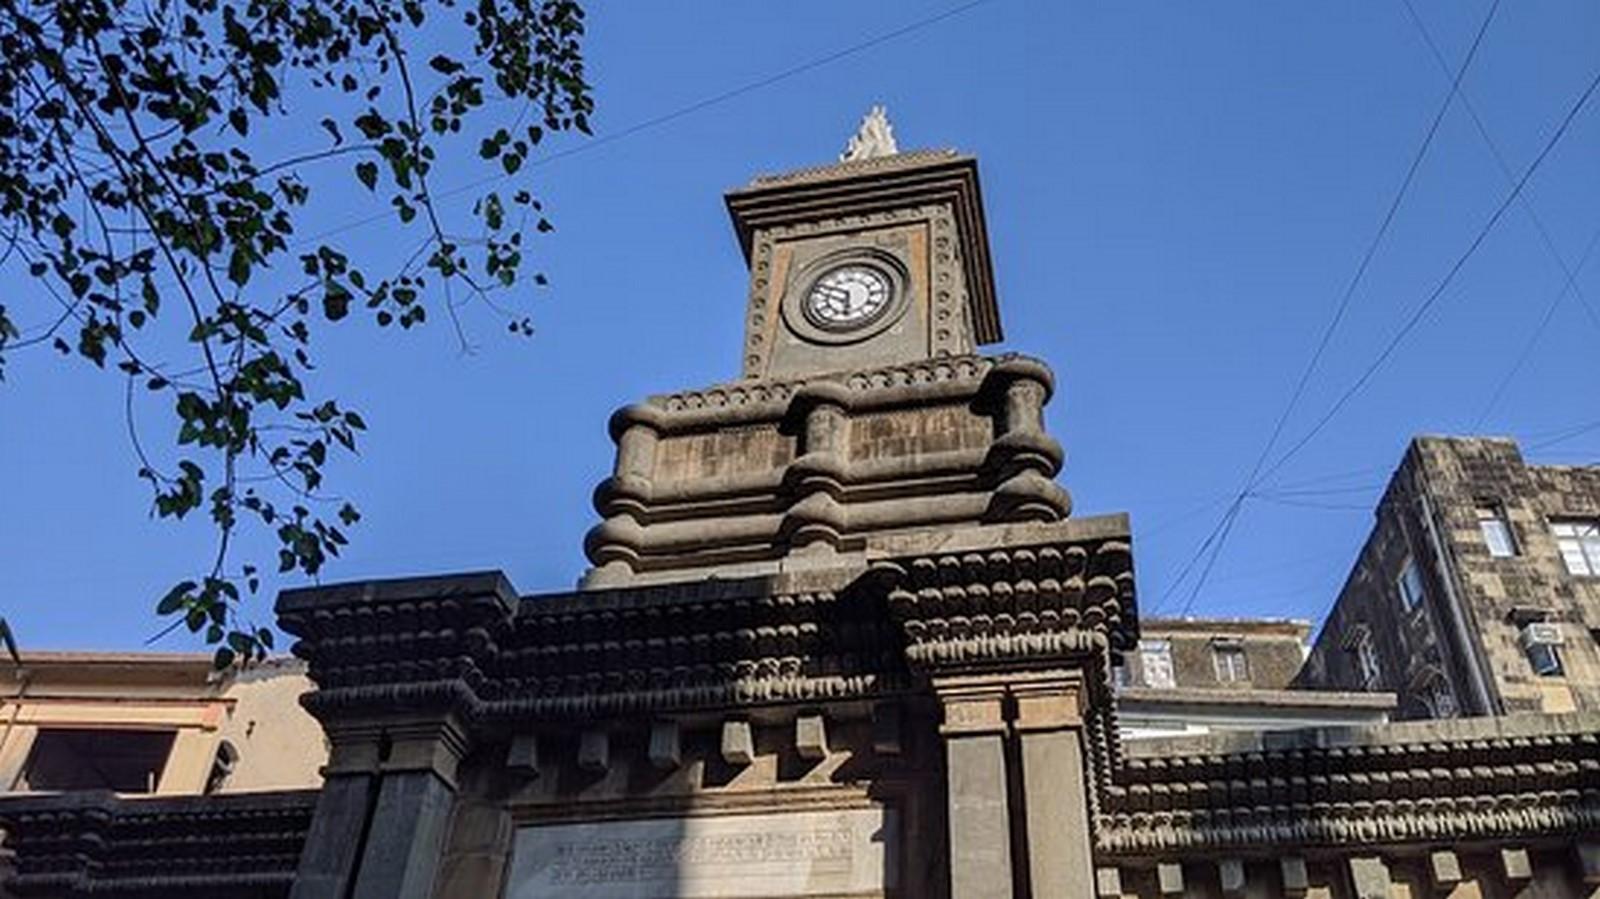 Bomanjee Hormarjee Wadia Fountain and Clock Tower, Vikas Dilawari - Sheet1